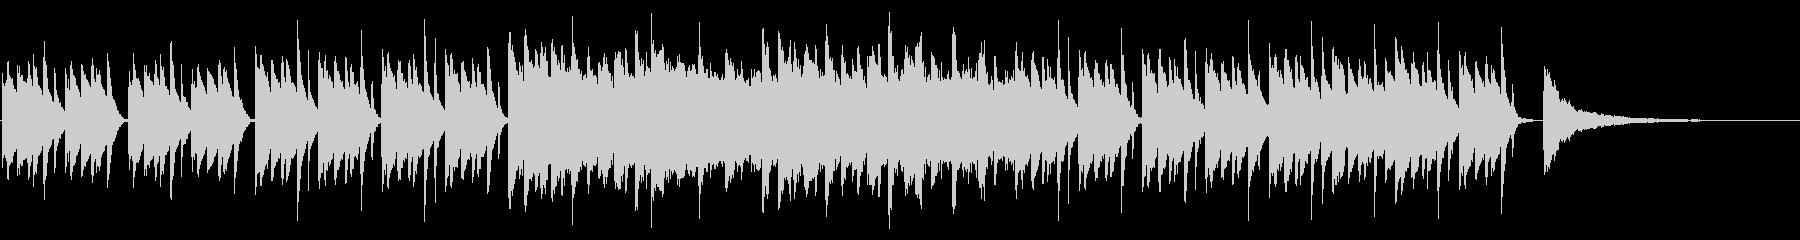 SNS広告 ピアノメイン ミニマル2の未再生の波形